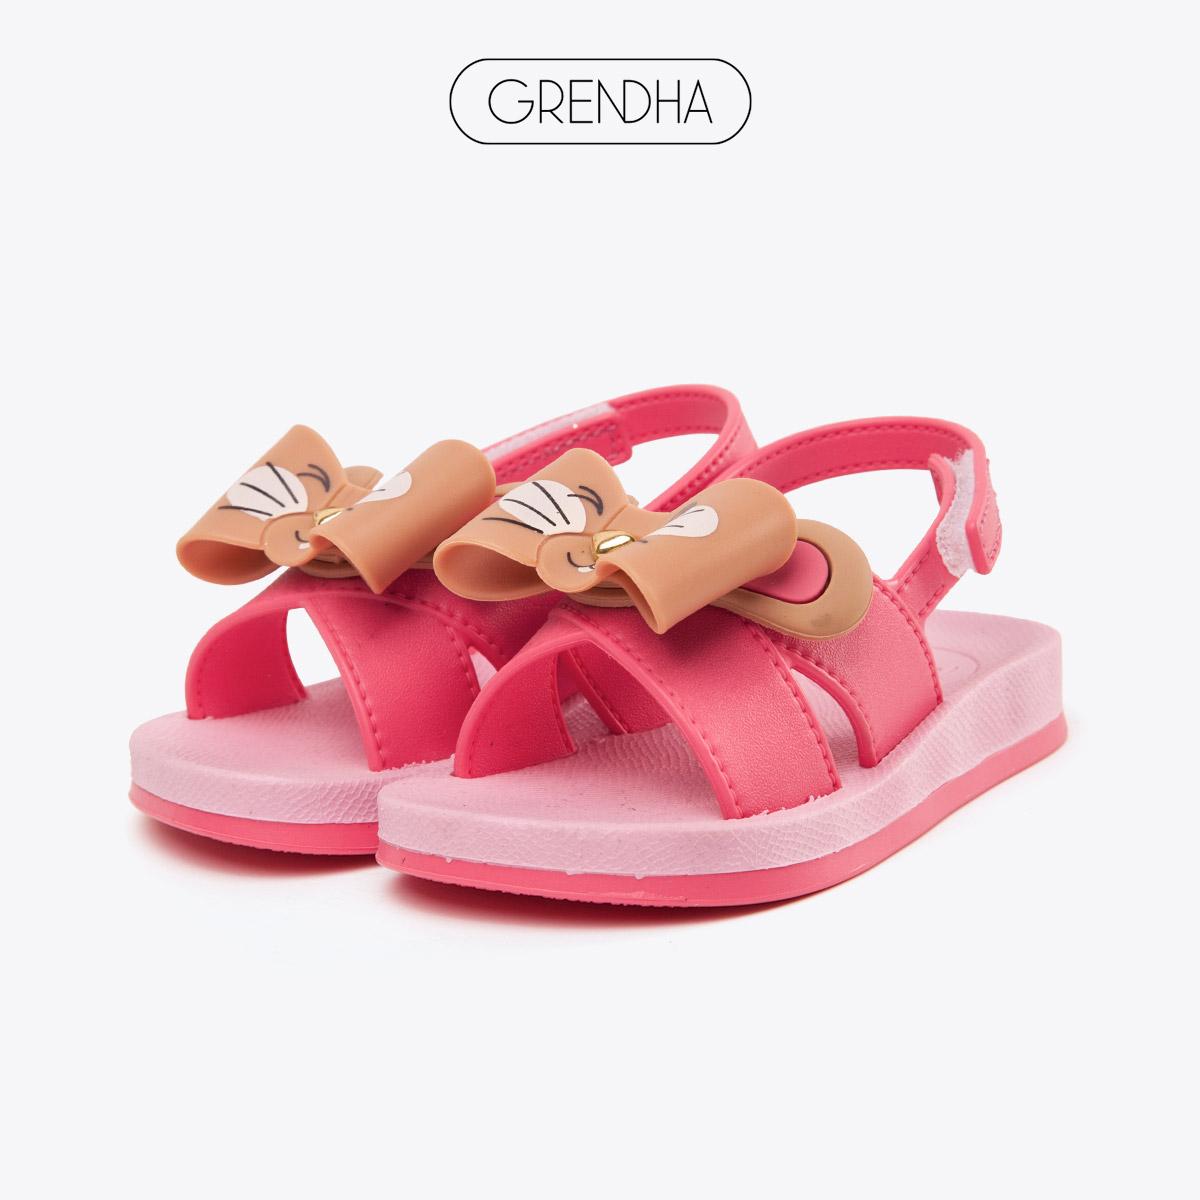 GRENDHA 巴西进口 软底防滑 儿童凉鞋  天猫优惠券折后¥69包邮(¥219-150)1-4岁4色可选 美亚$33